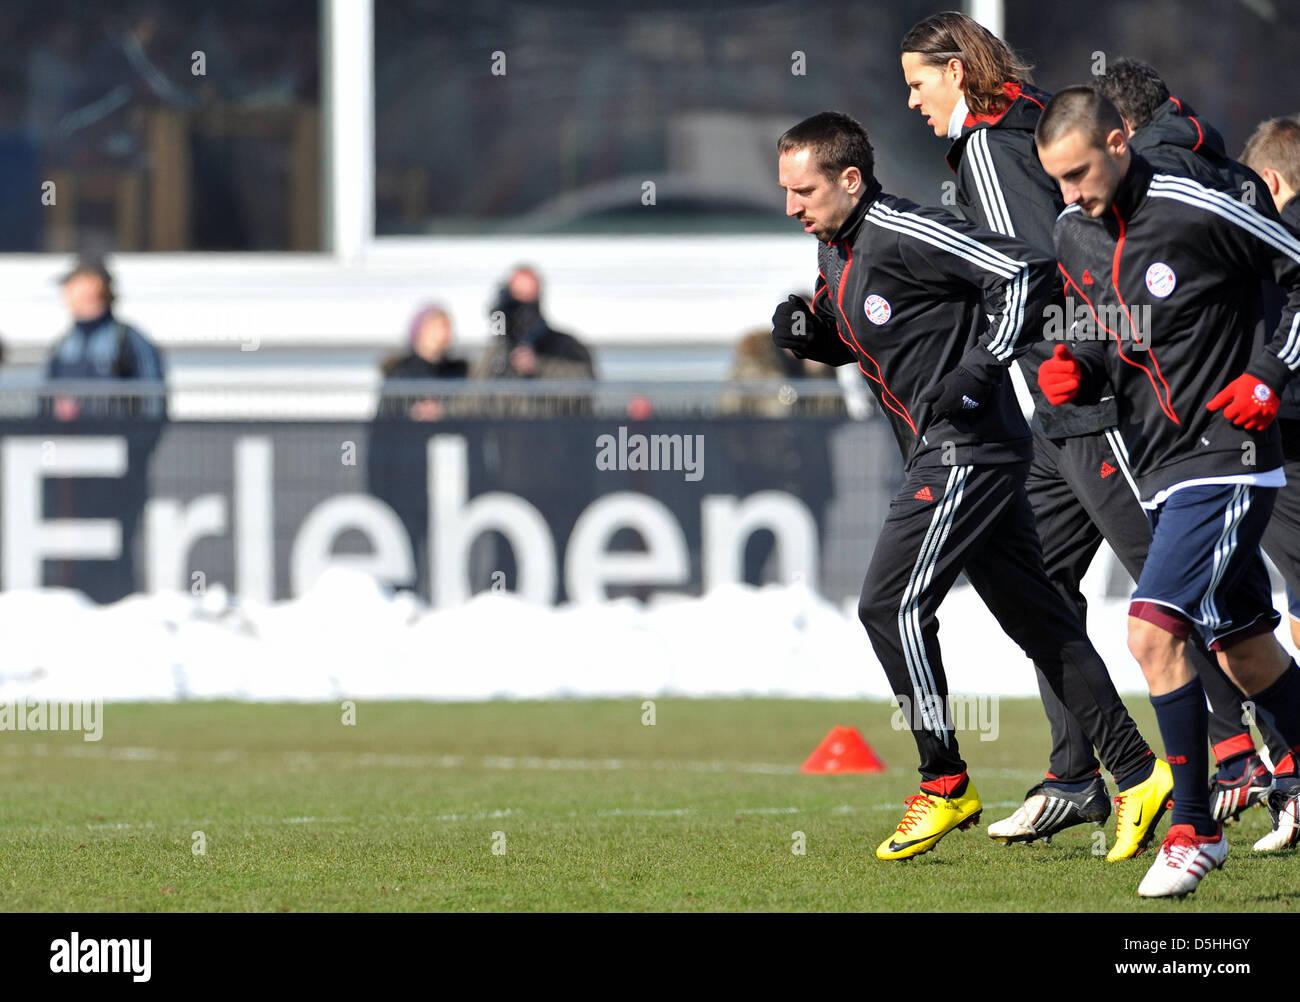 Bundesliga tedesca club FC Bayern Monaco di Baviera (L-R) Franck Ribery, Daniel van Buyten e Diego contento durante Immagini Stock